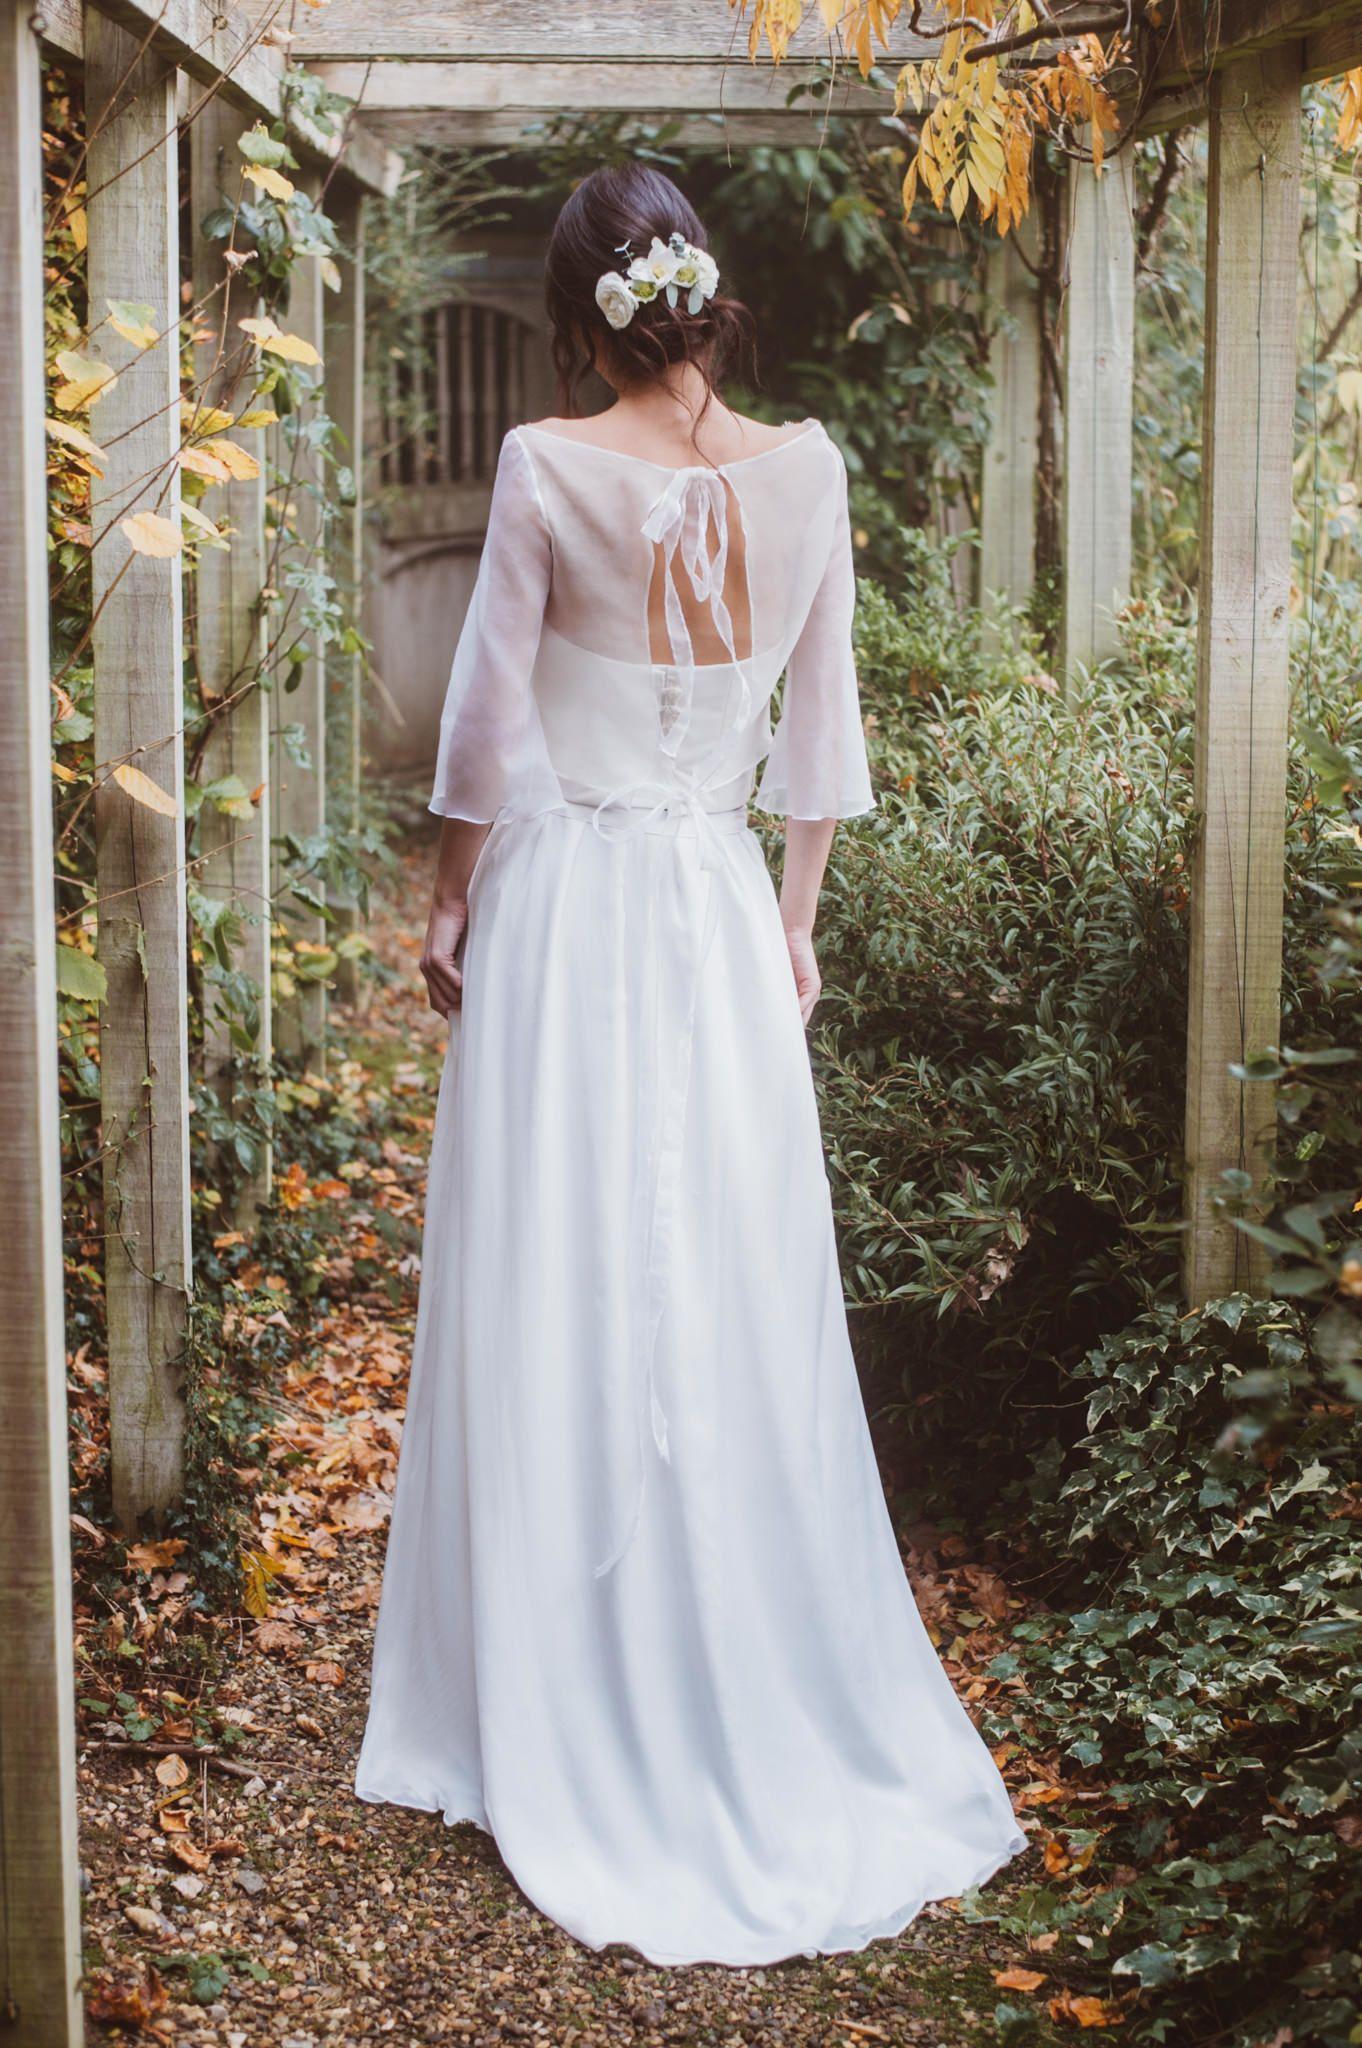 Bohemian bride bridal separates by jessica turner designs